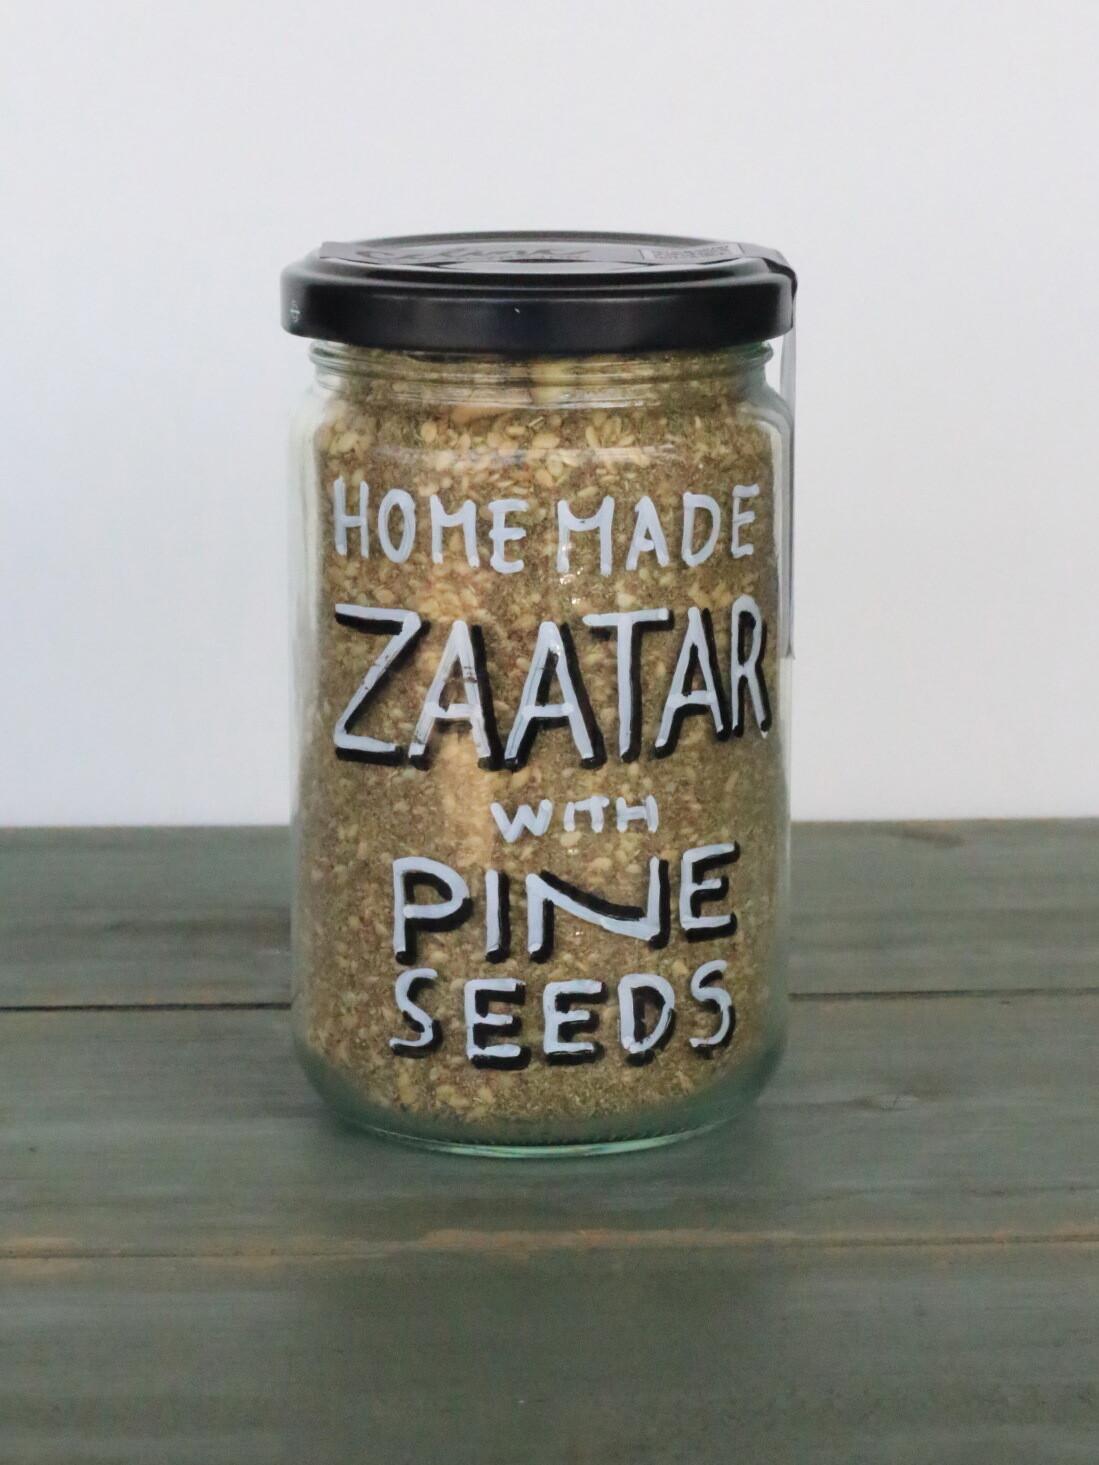 Small Zaatar with Pine Seeds زعتر صغير مع بذور الصنوبر (Jar) - Celine Home Made Delights